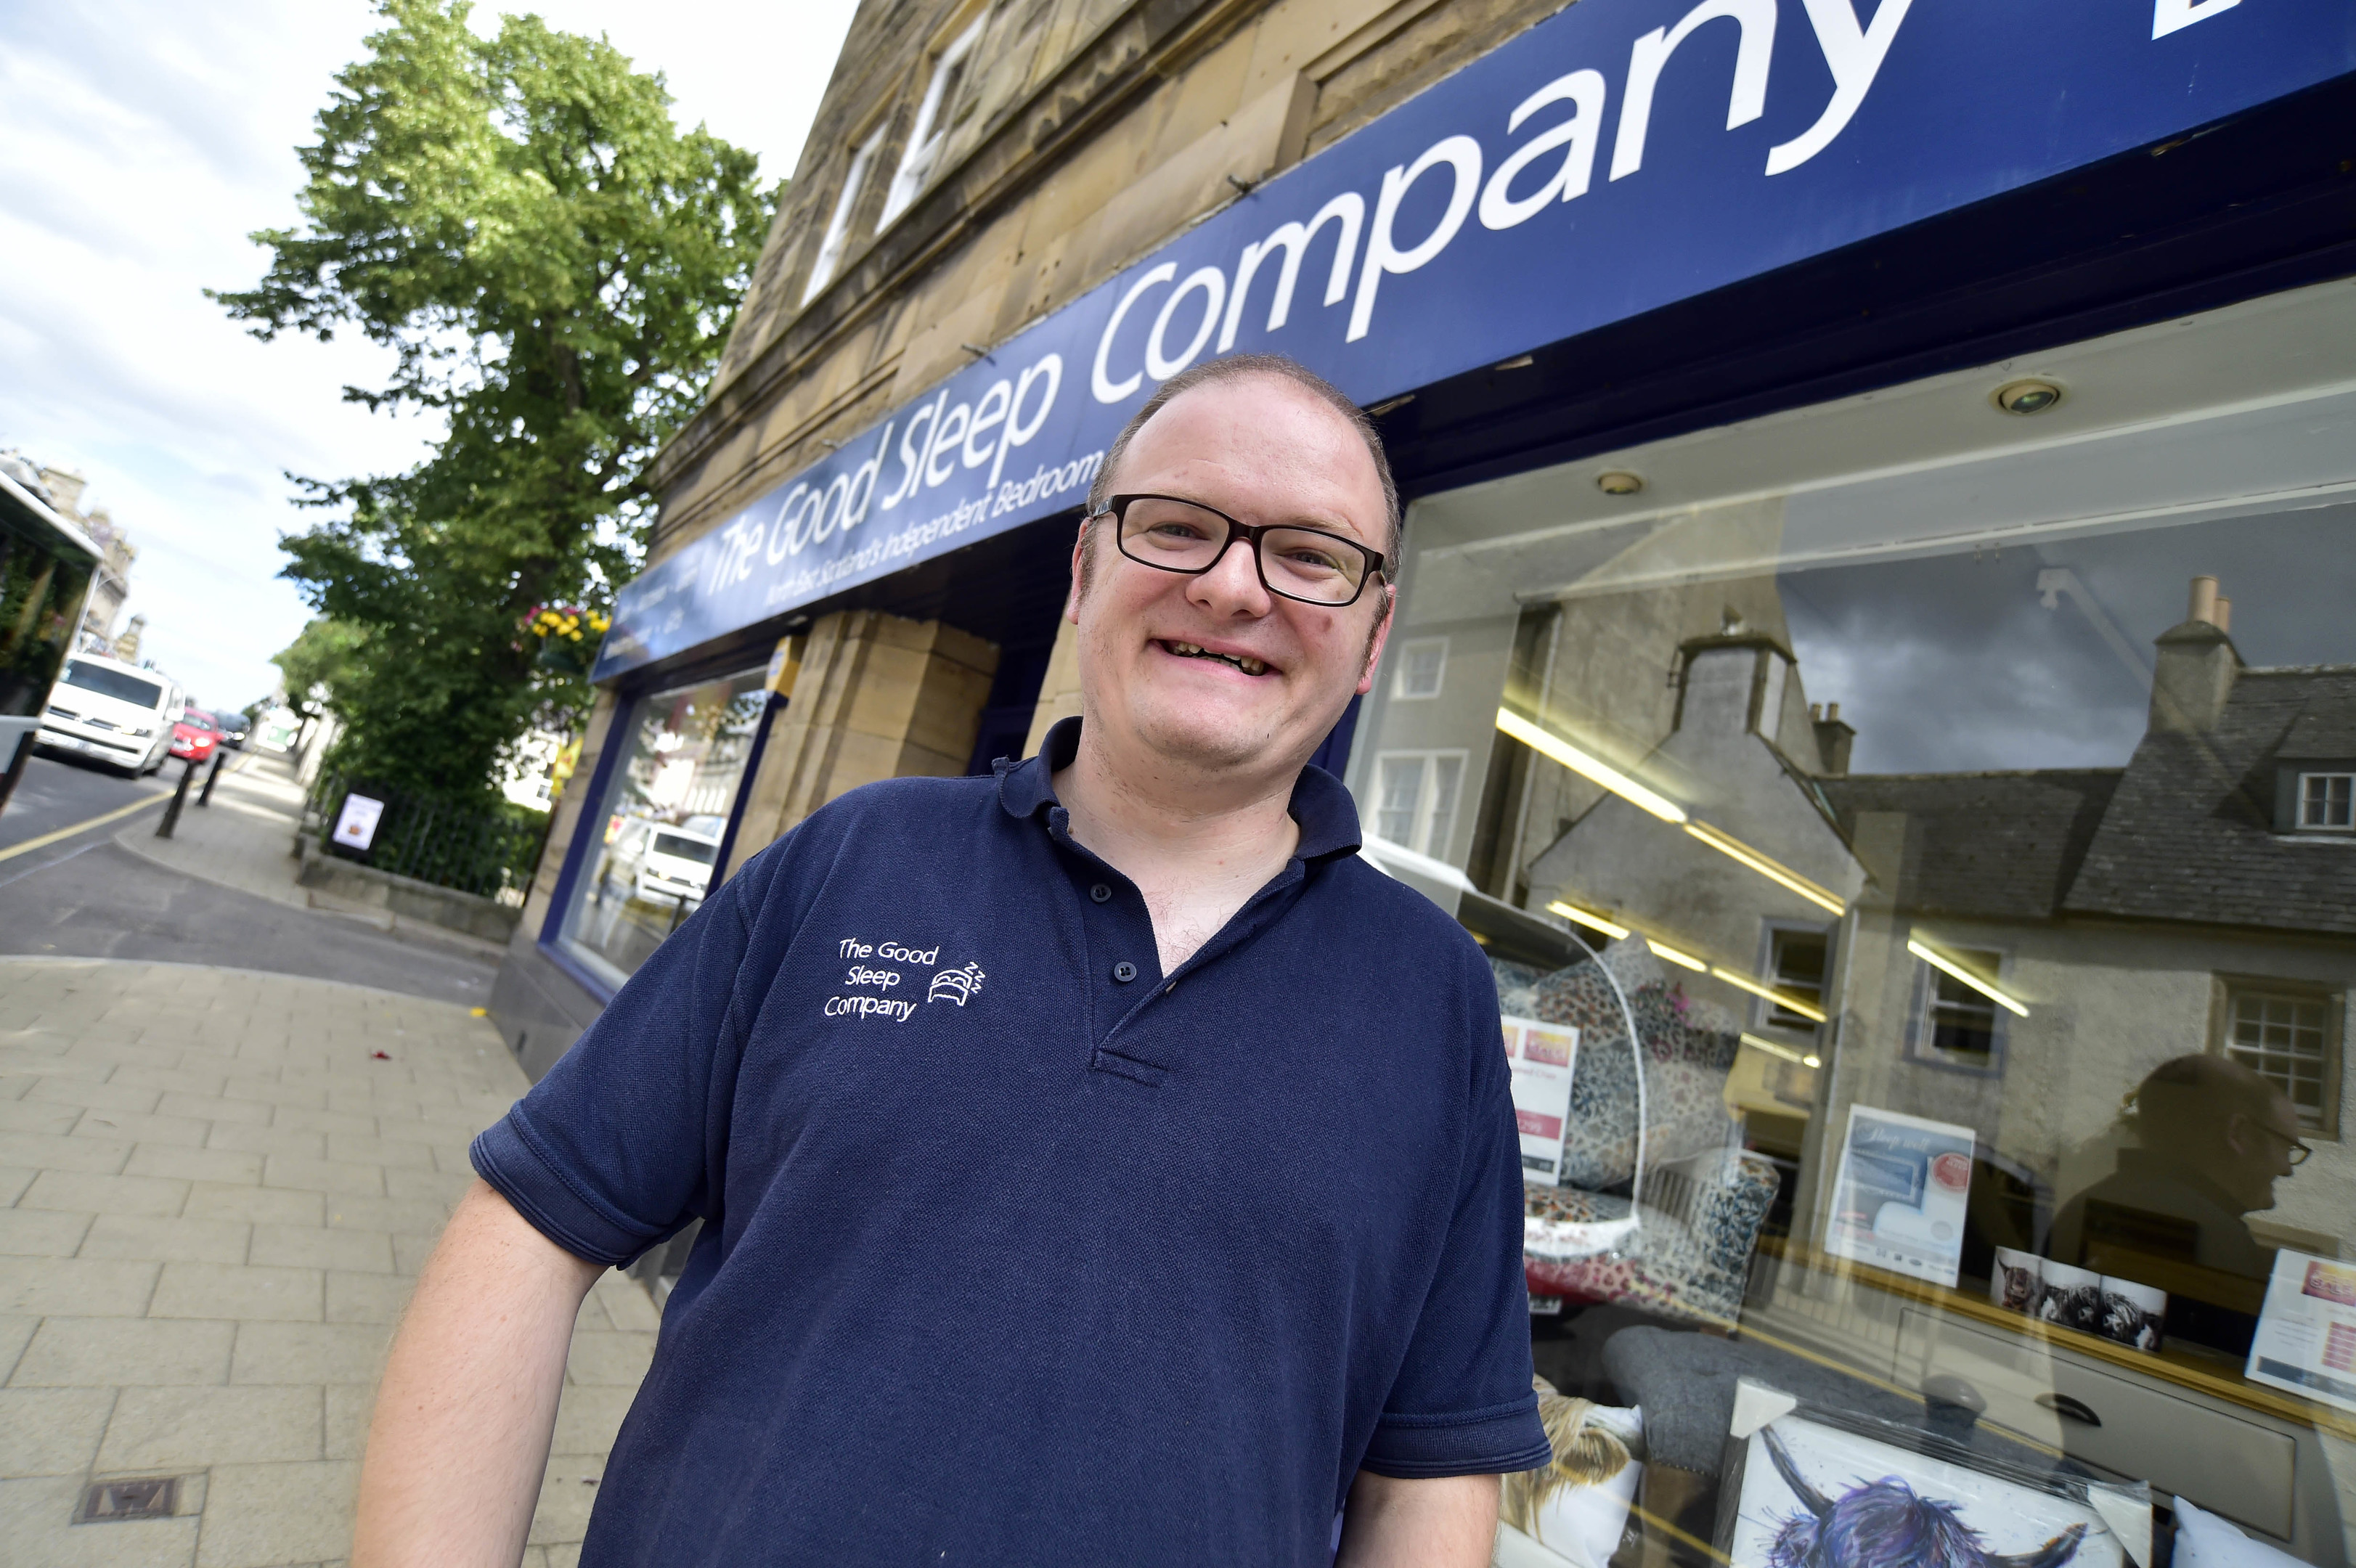 Scott Birnie runs the Good Sleep Company bed shop on the High Street